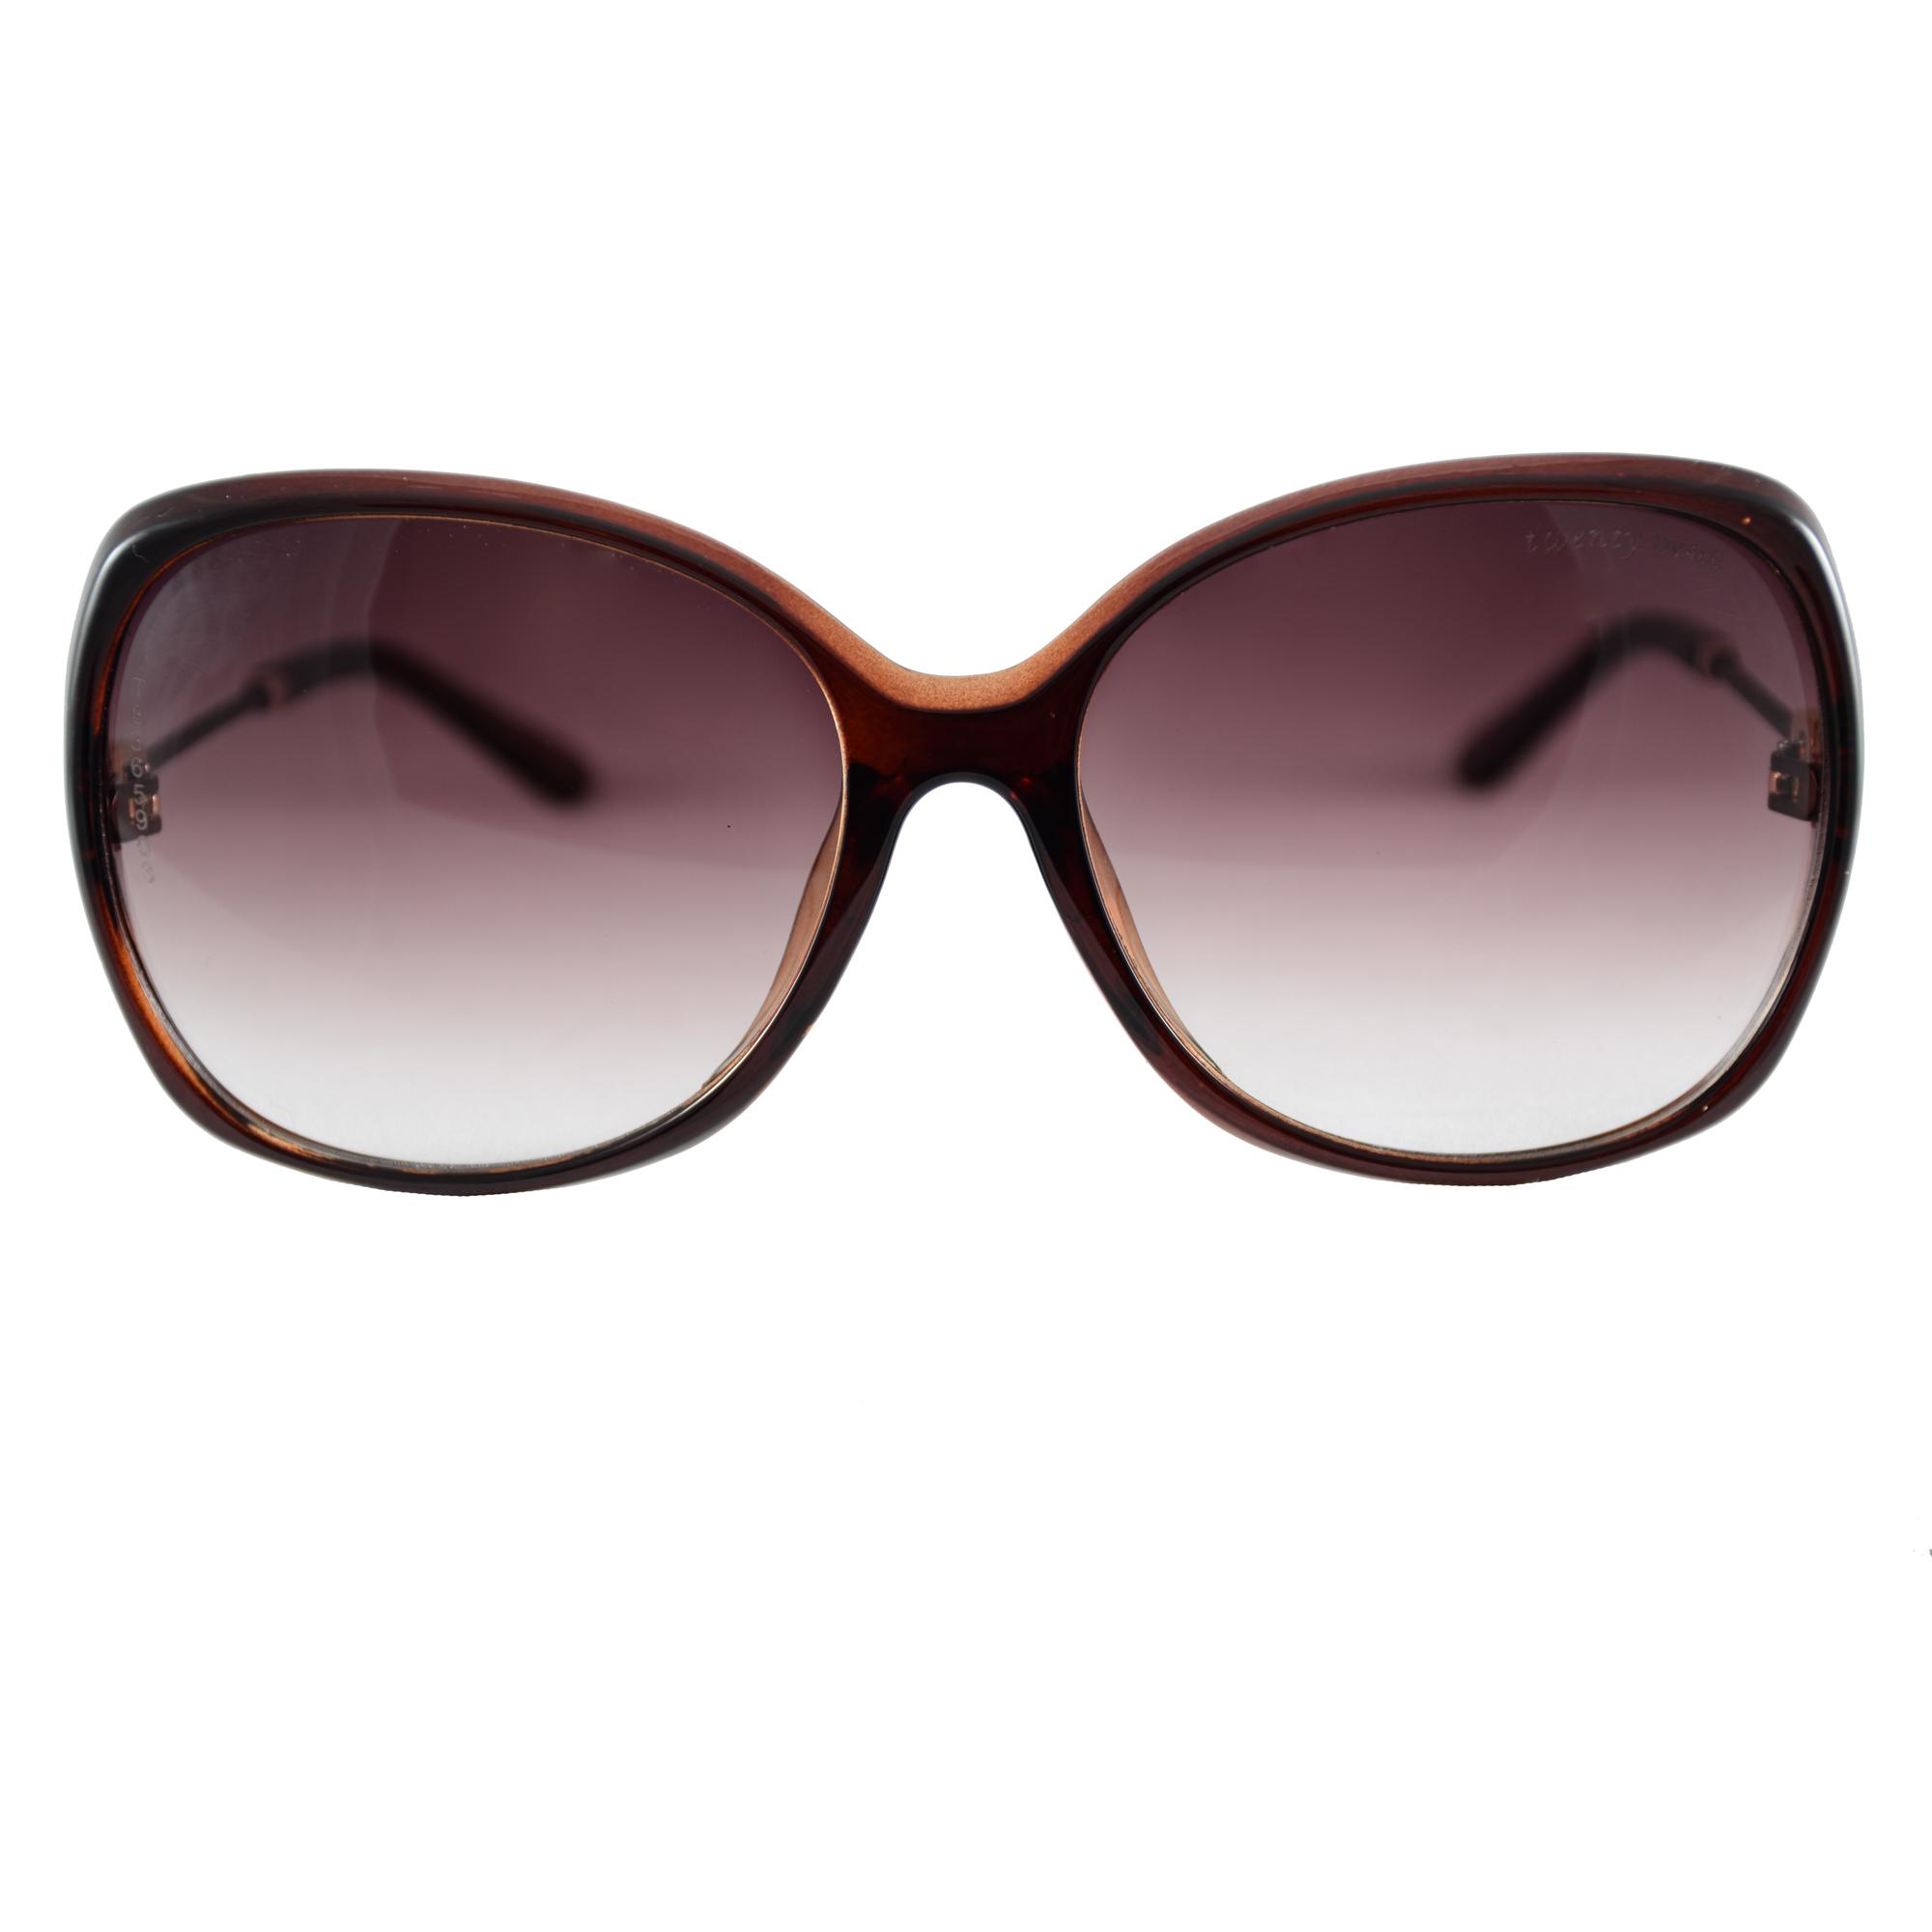 عینک آفتابی زنانه توئنتی مدل AC4-Z65-023-B5-D89